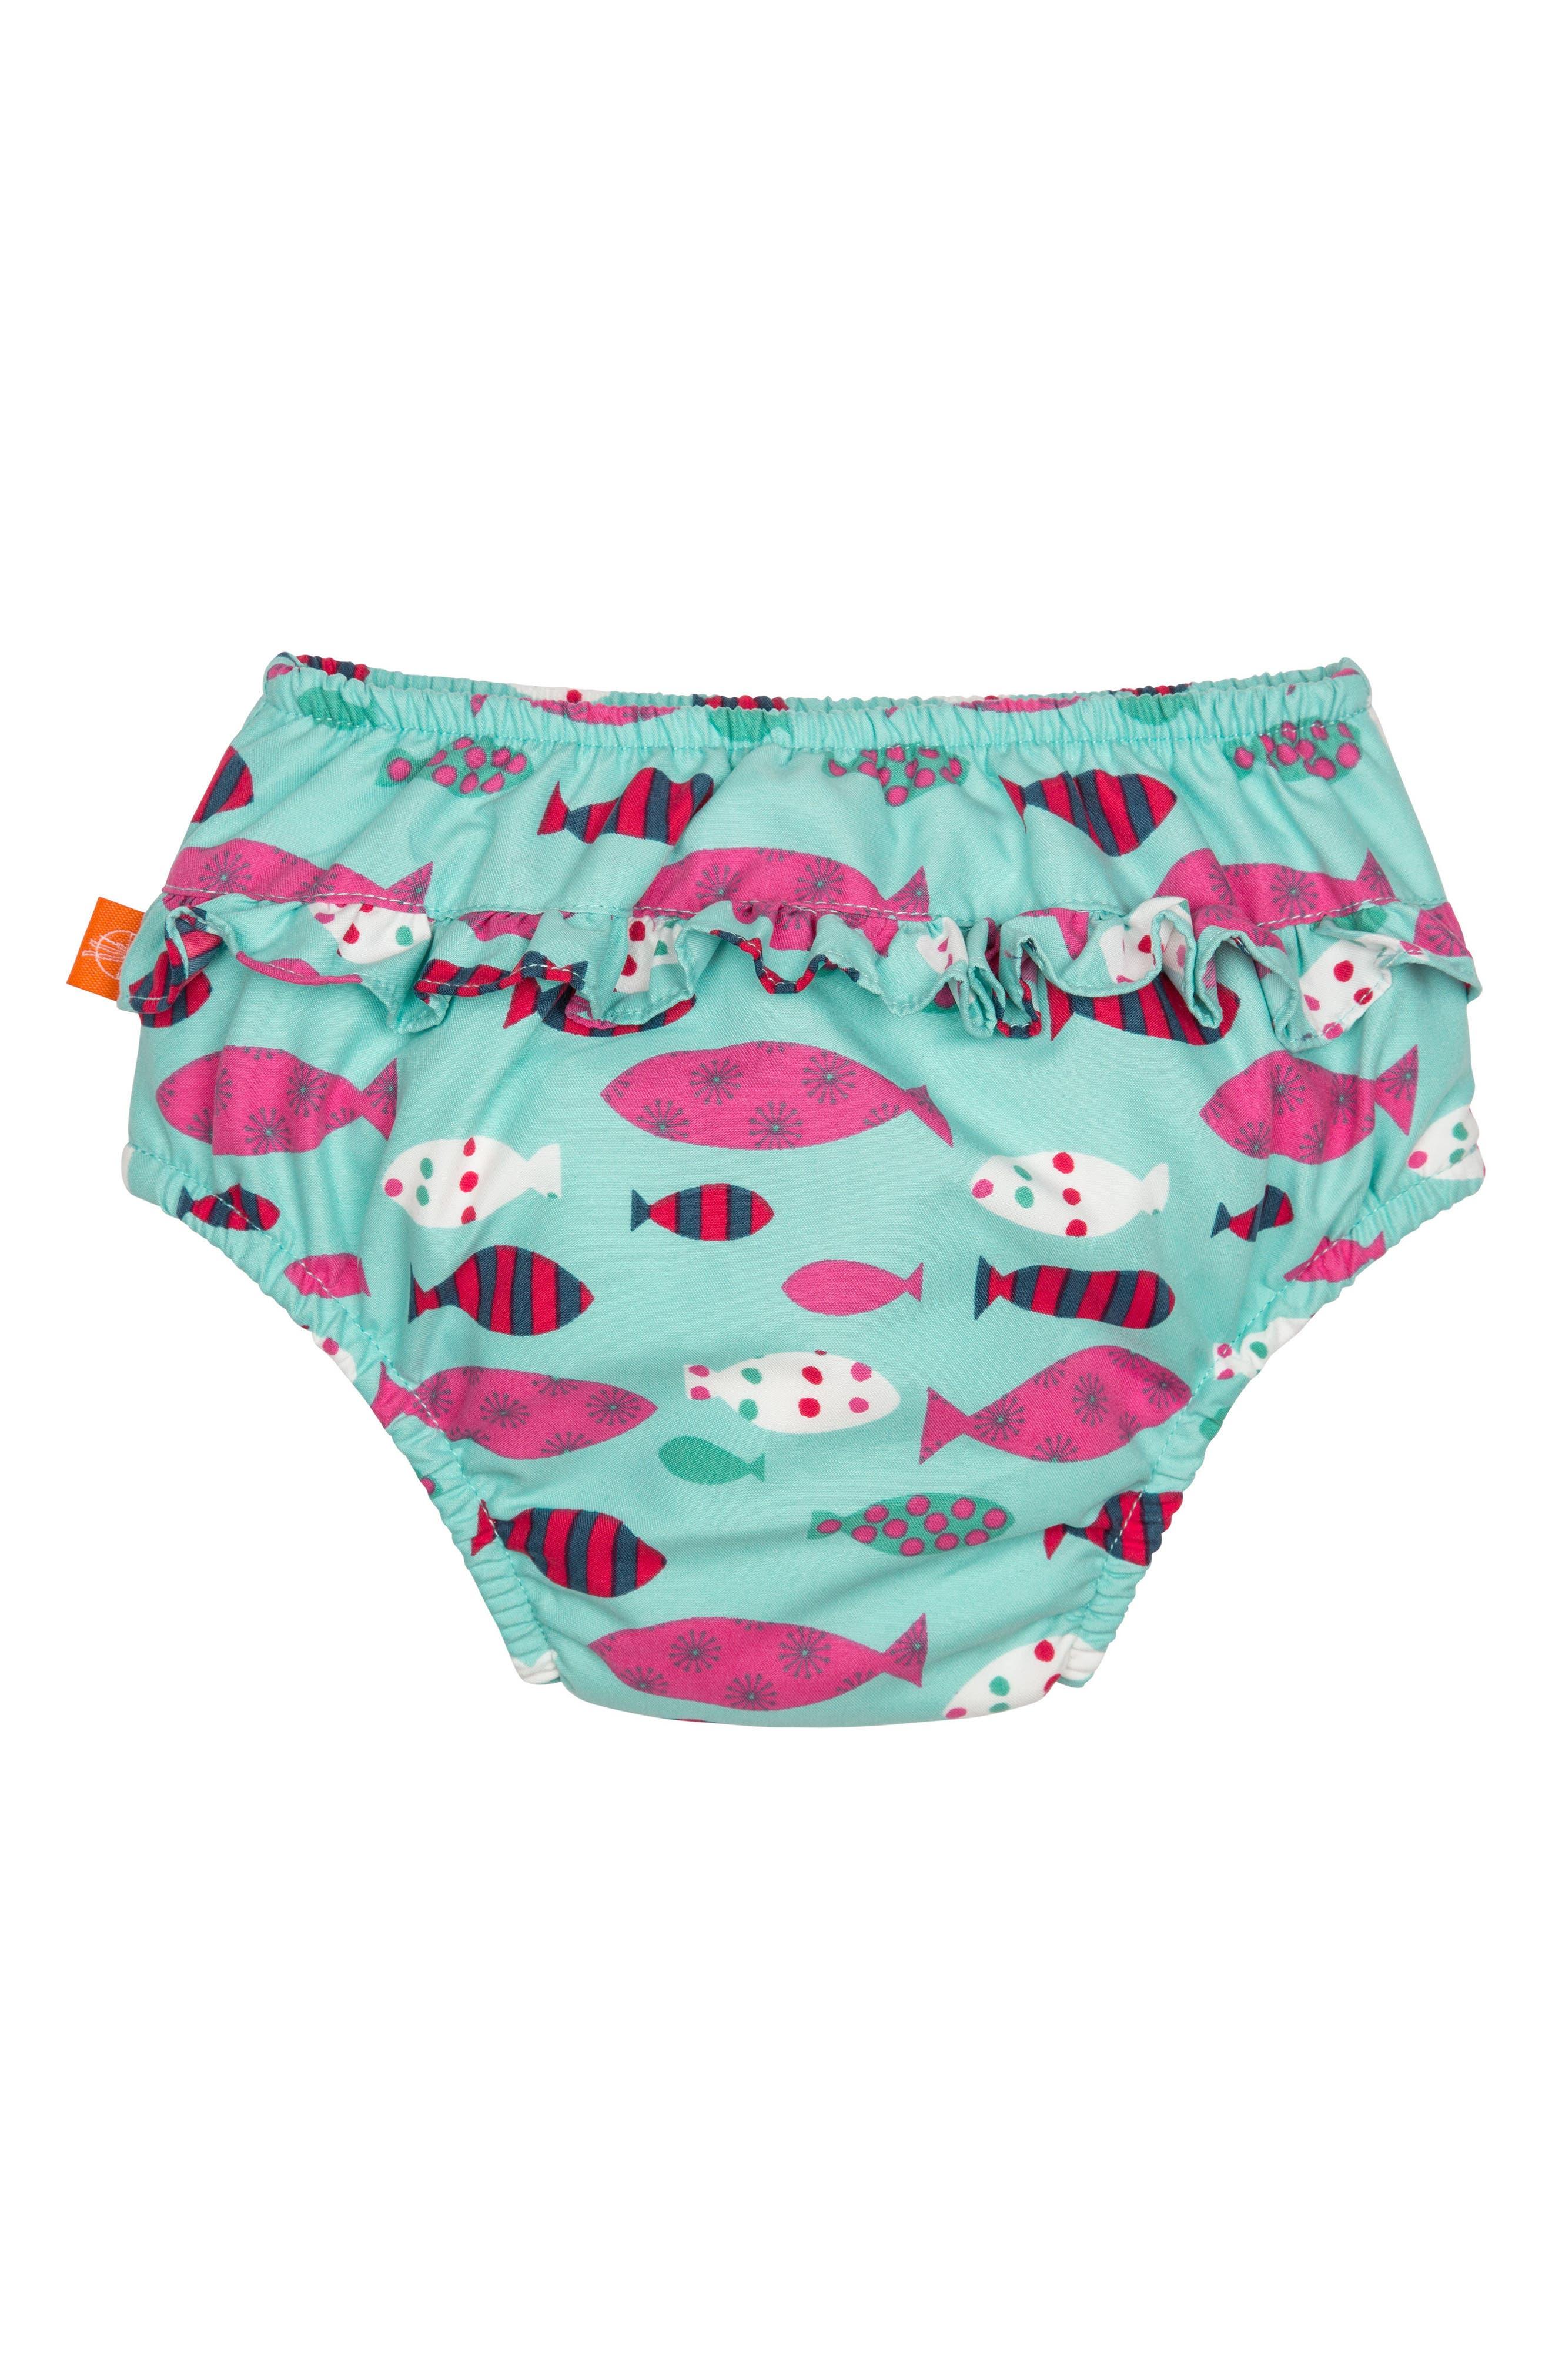 Mr. Fish Swim Diaper Cover,                             Alternate thumbnail 2, color,                             400